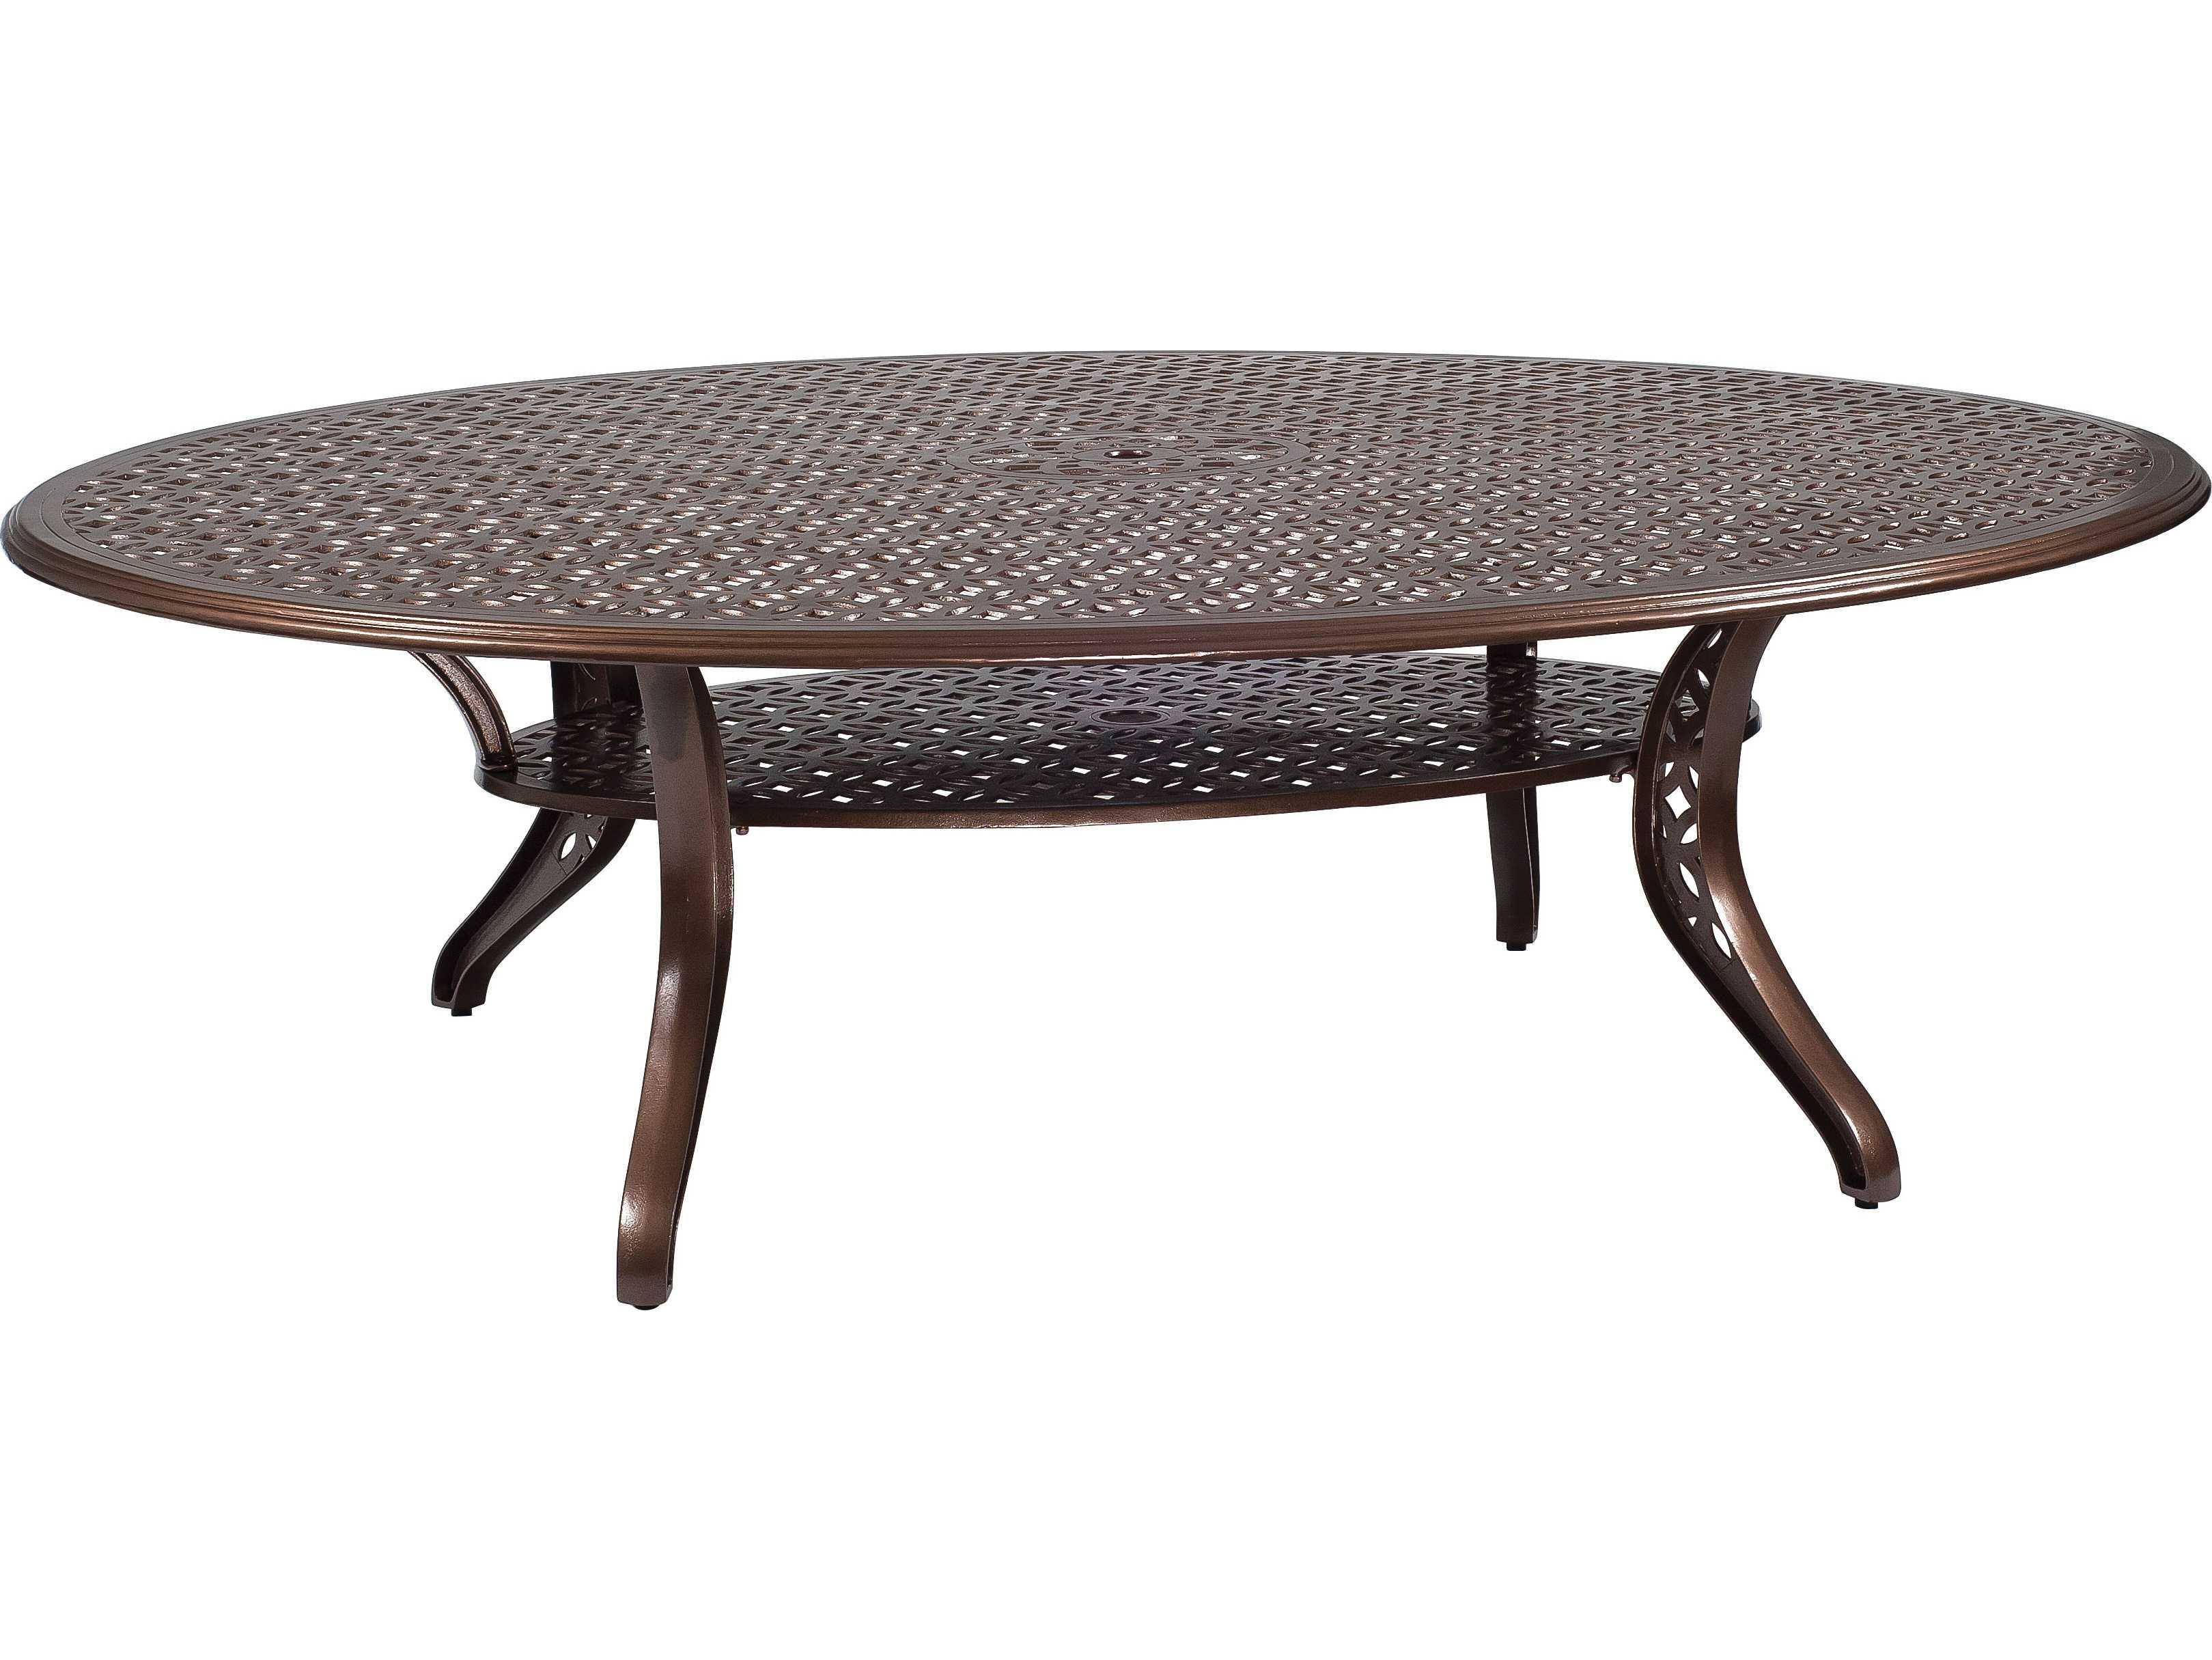 Woodard casa cast aluminum x 70 oval dining table - Aluminium picnic table with umbrella ...